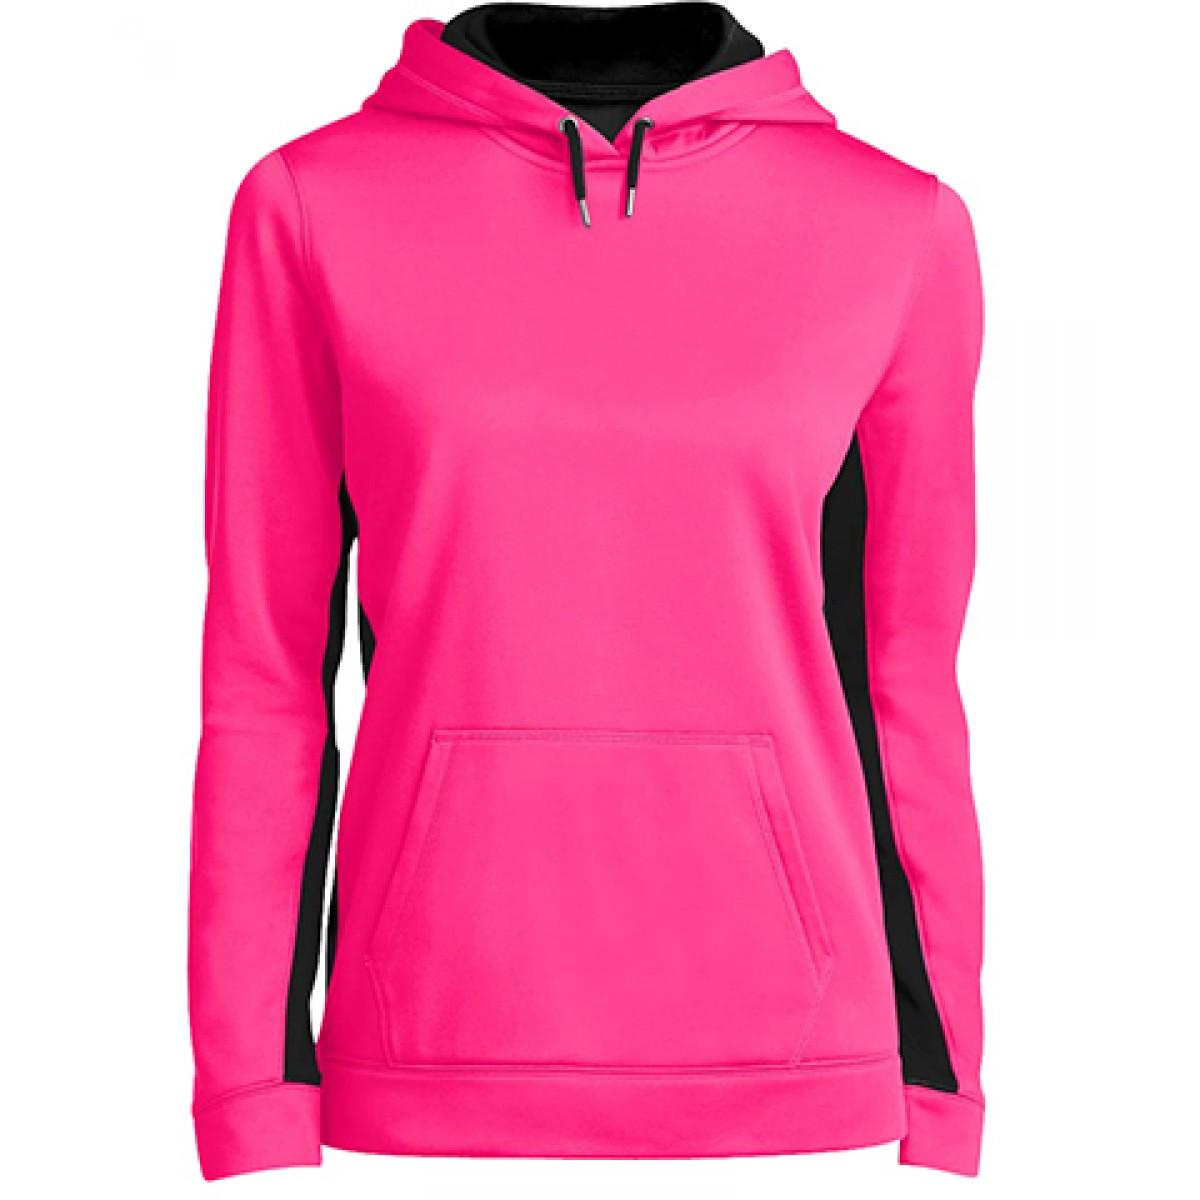 Ladies Colorblock Hooded Pullover-Neon Pink Black-L